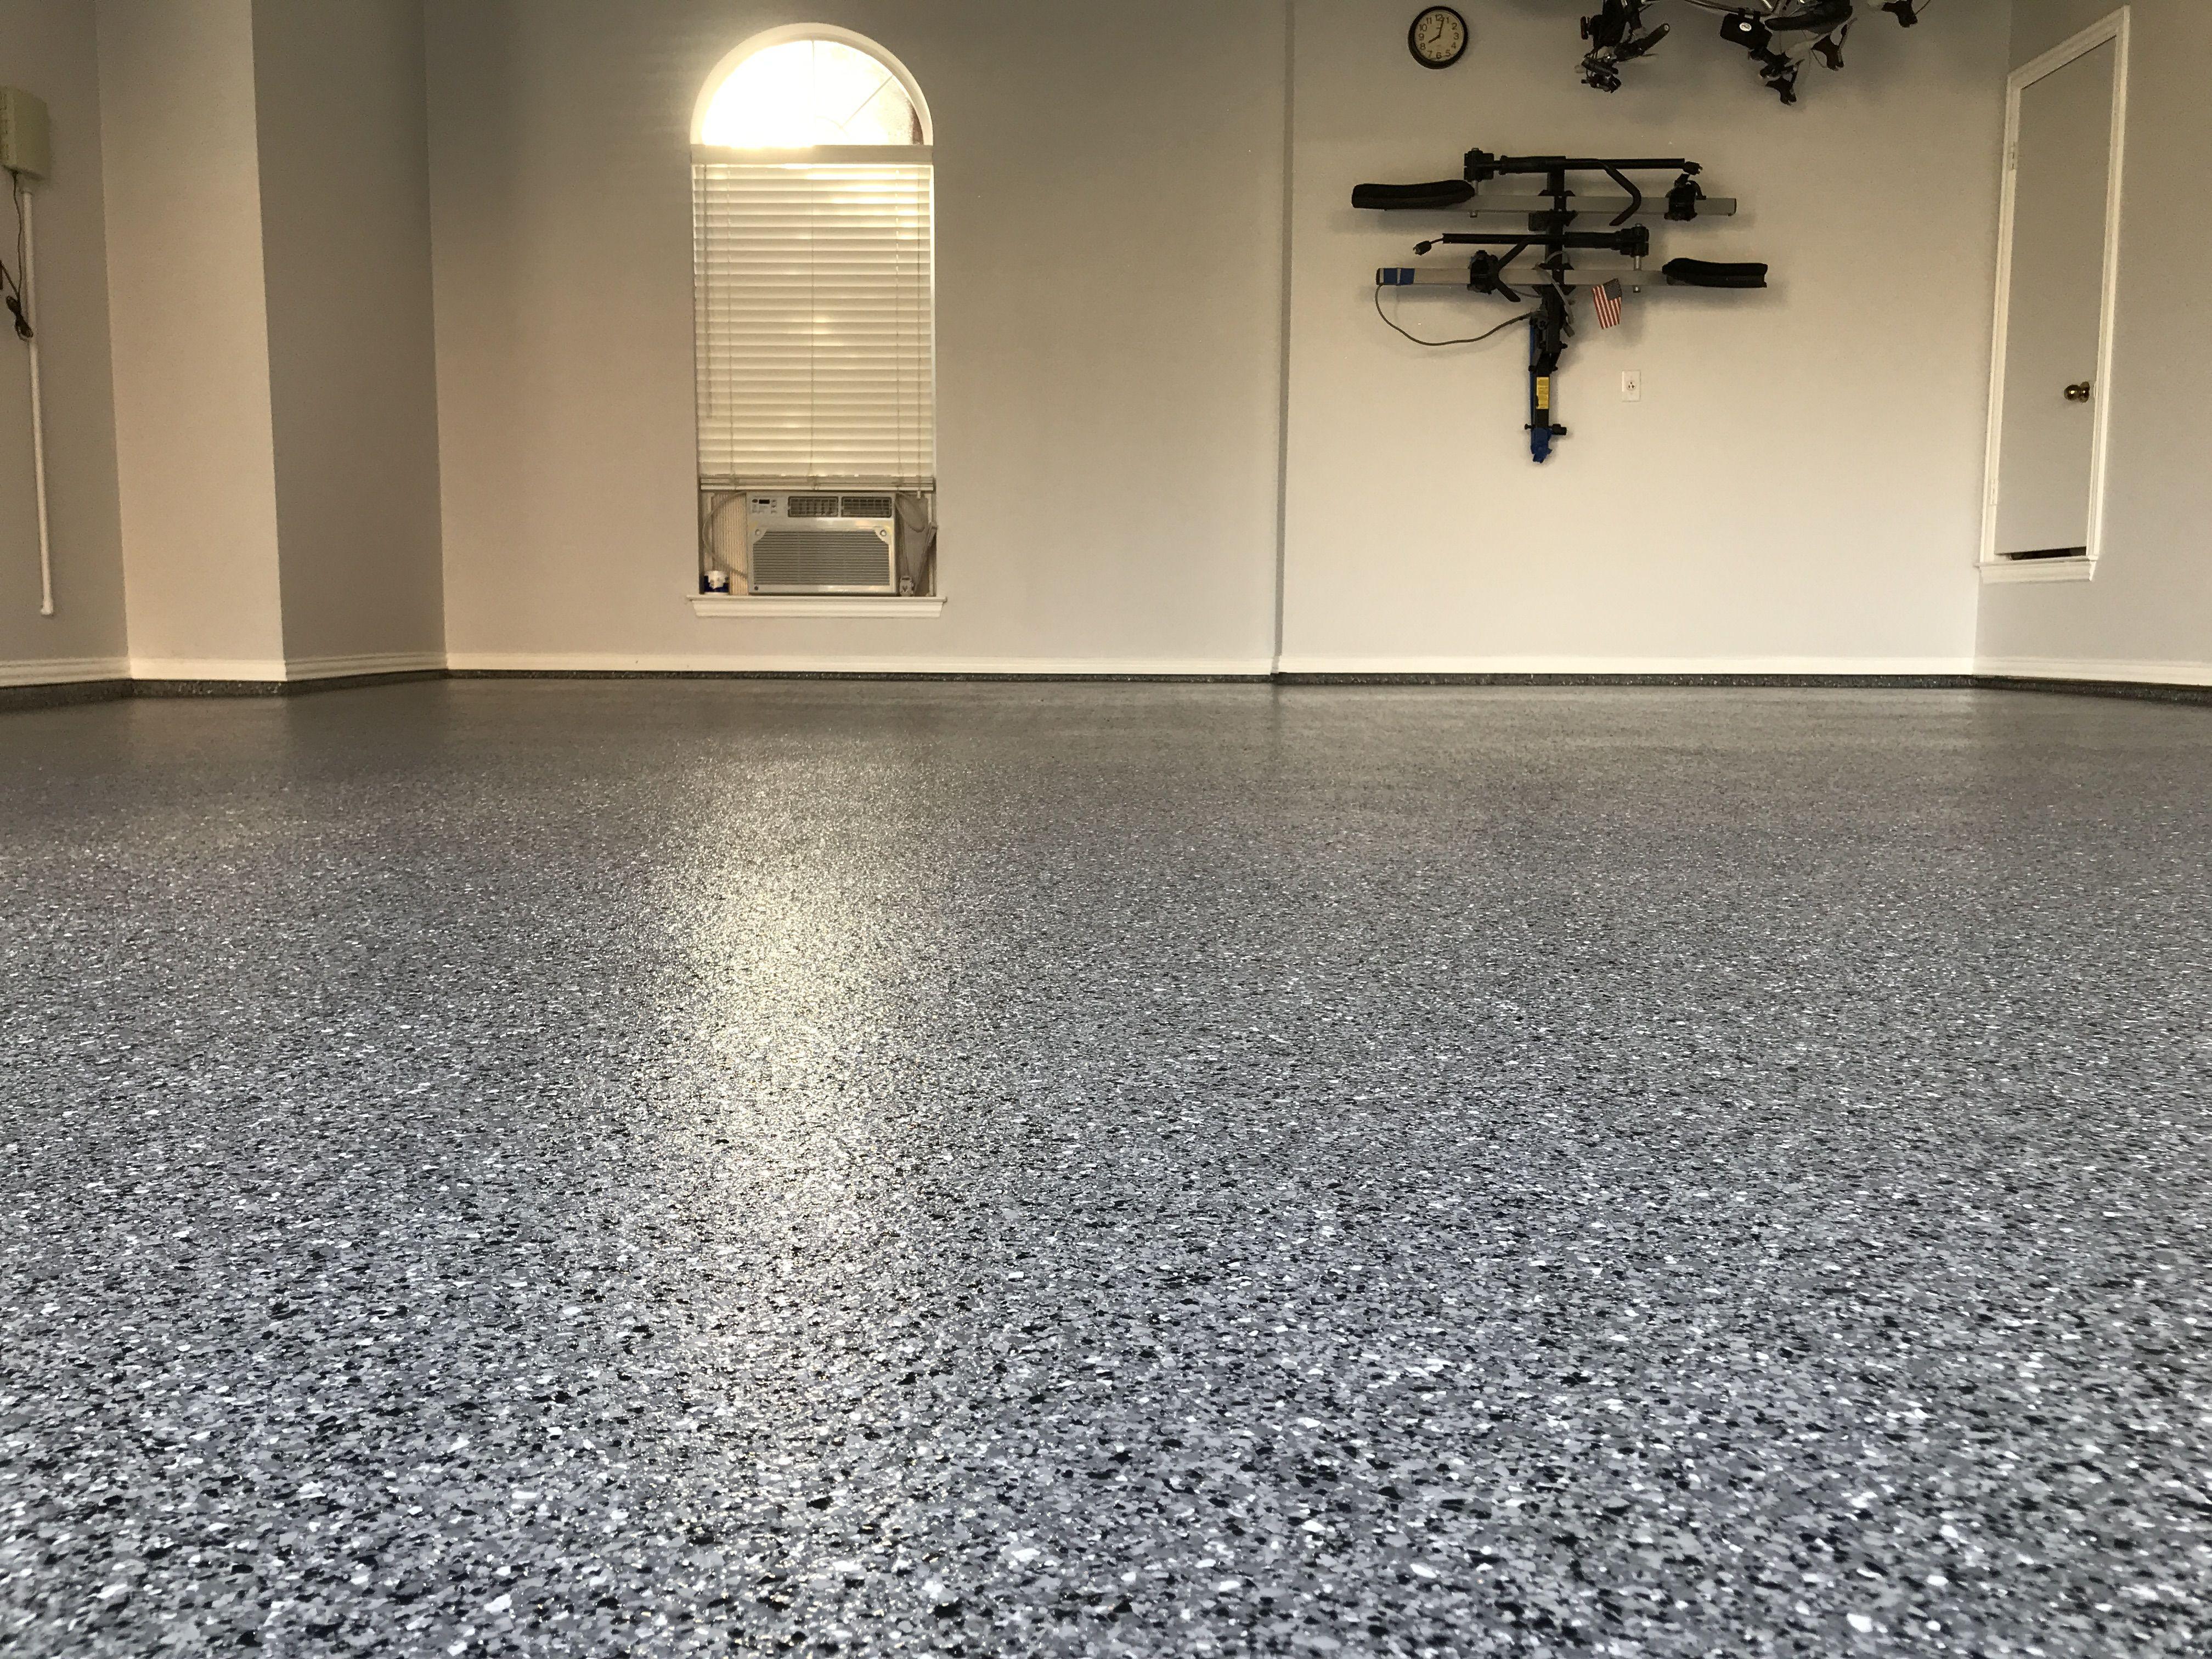 Classic Marble White Polyaspartic Epoxy Garage Floor Garage Floor Epoxy Garage Floor Flooring Contractor